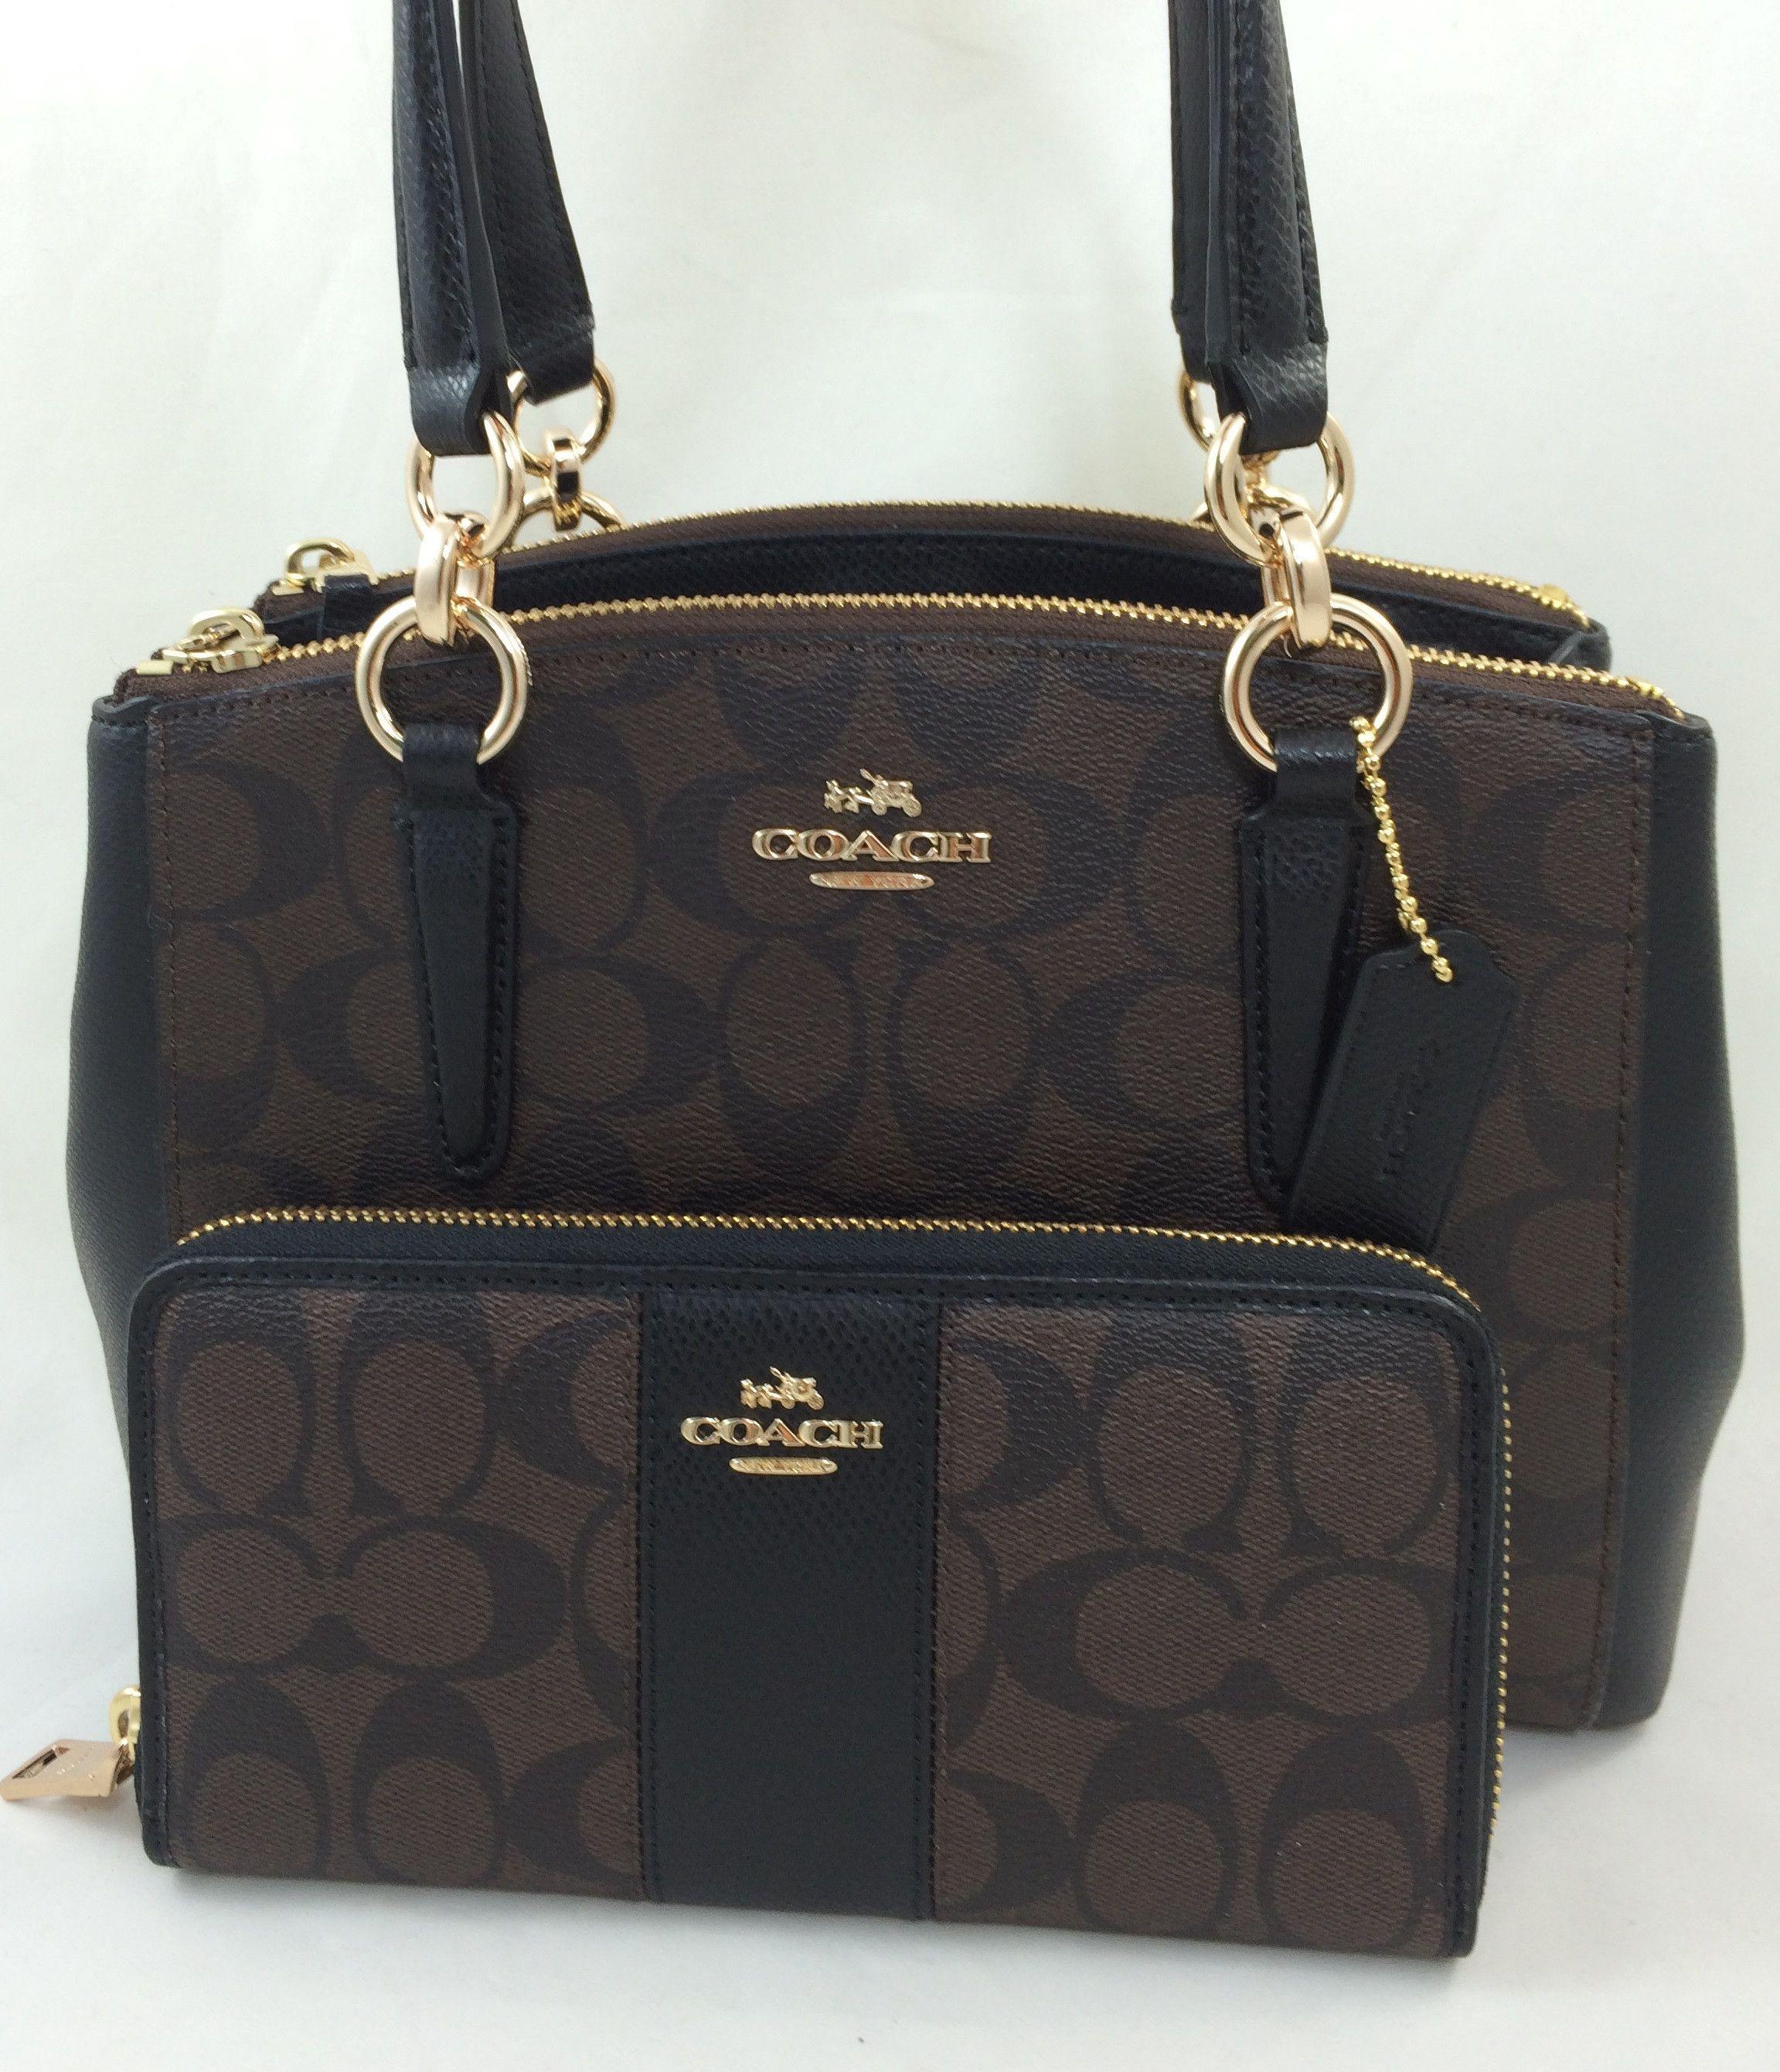 89d7cacac2 New Authentic Coach F58290 Mini Christie Carryall Satchel Handbag Purse Bag  PVC Brown Black +Wallet Set